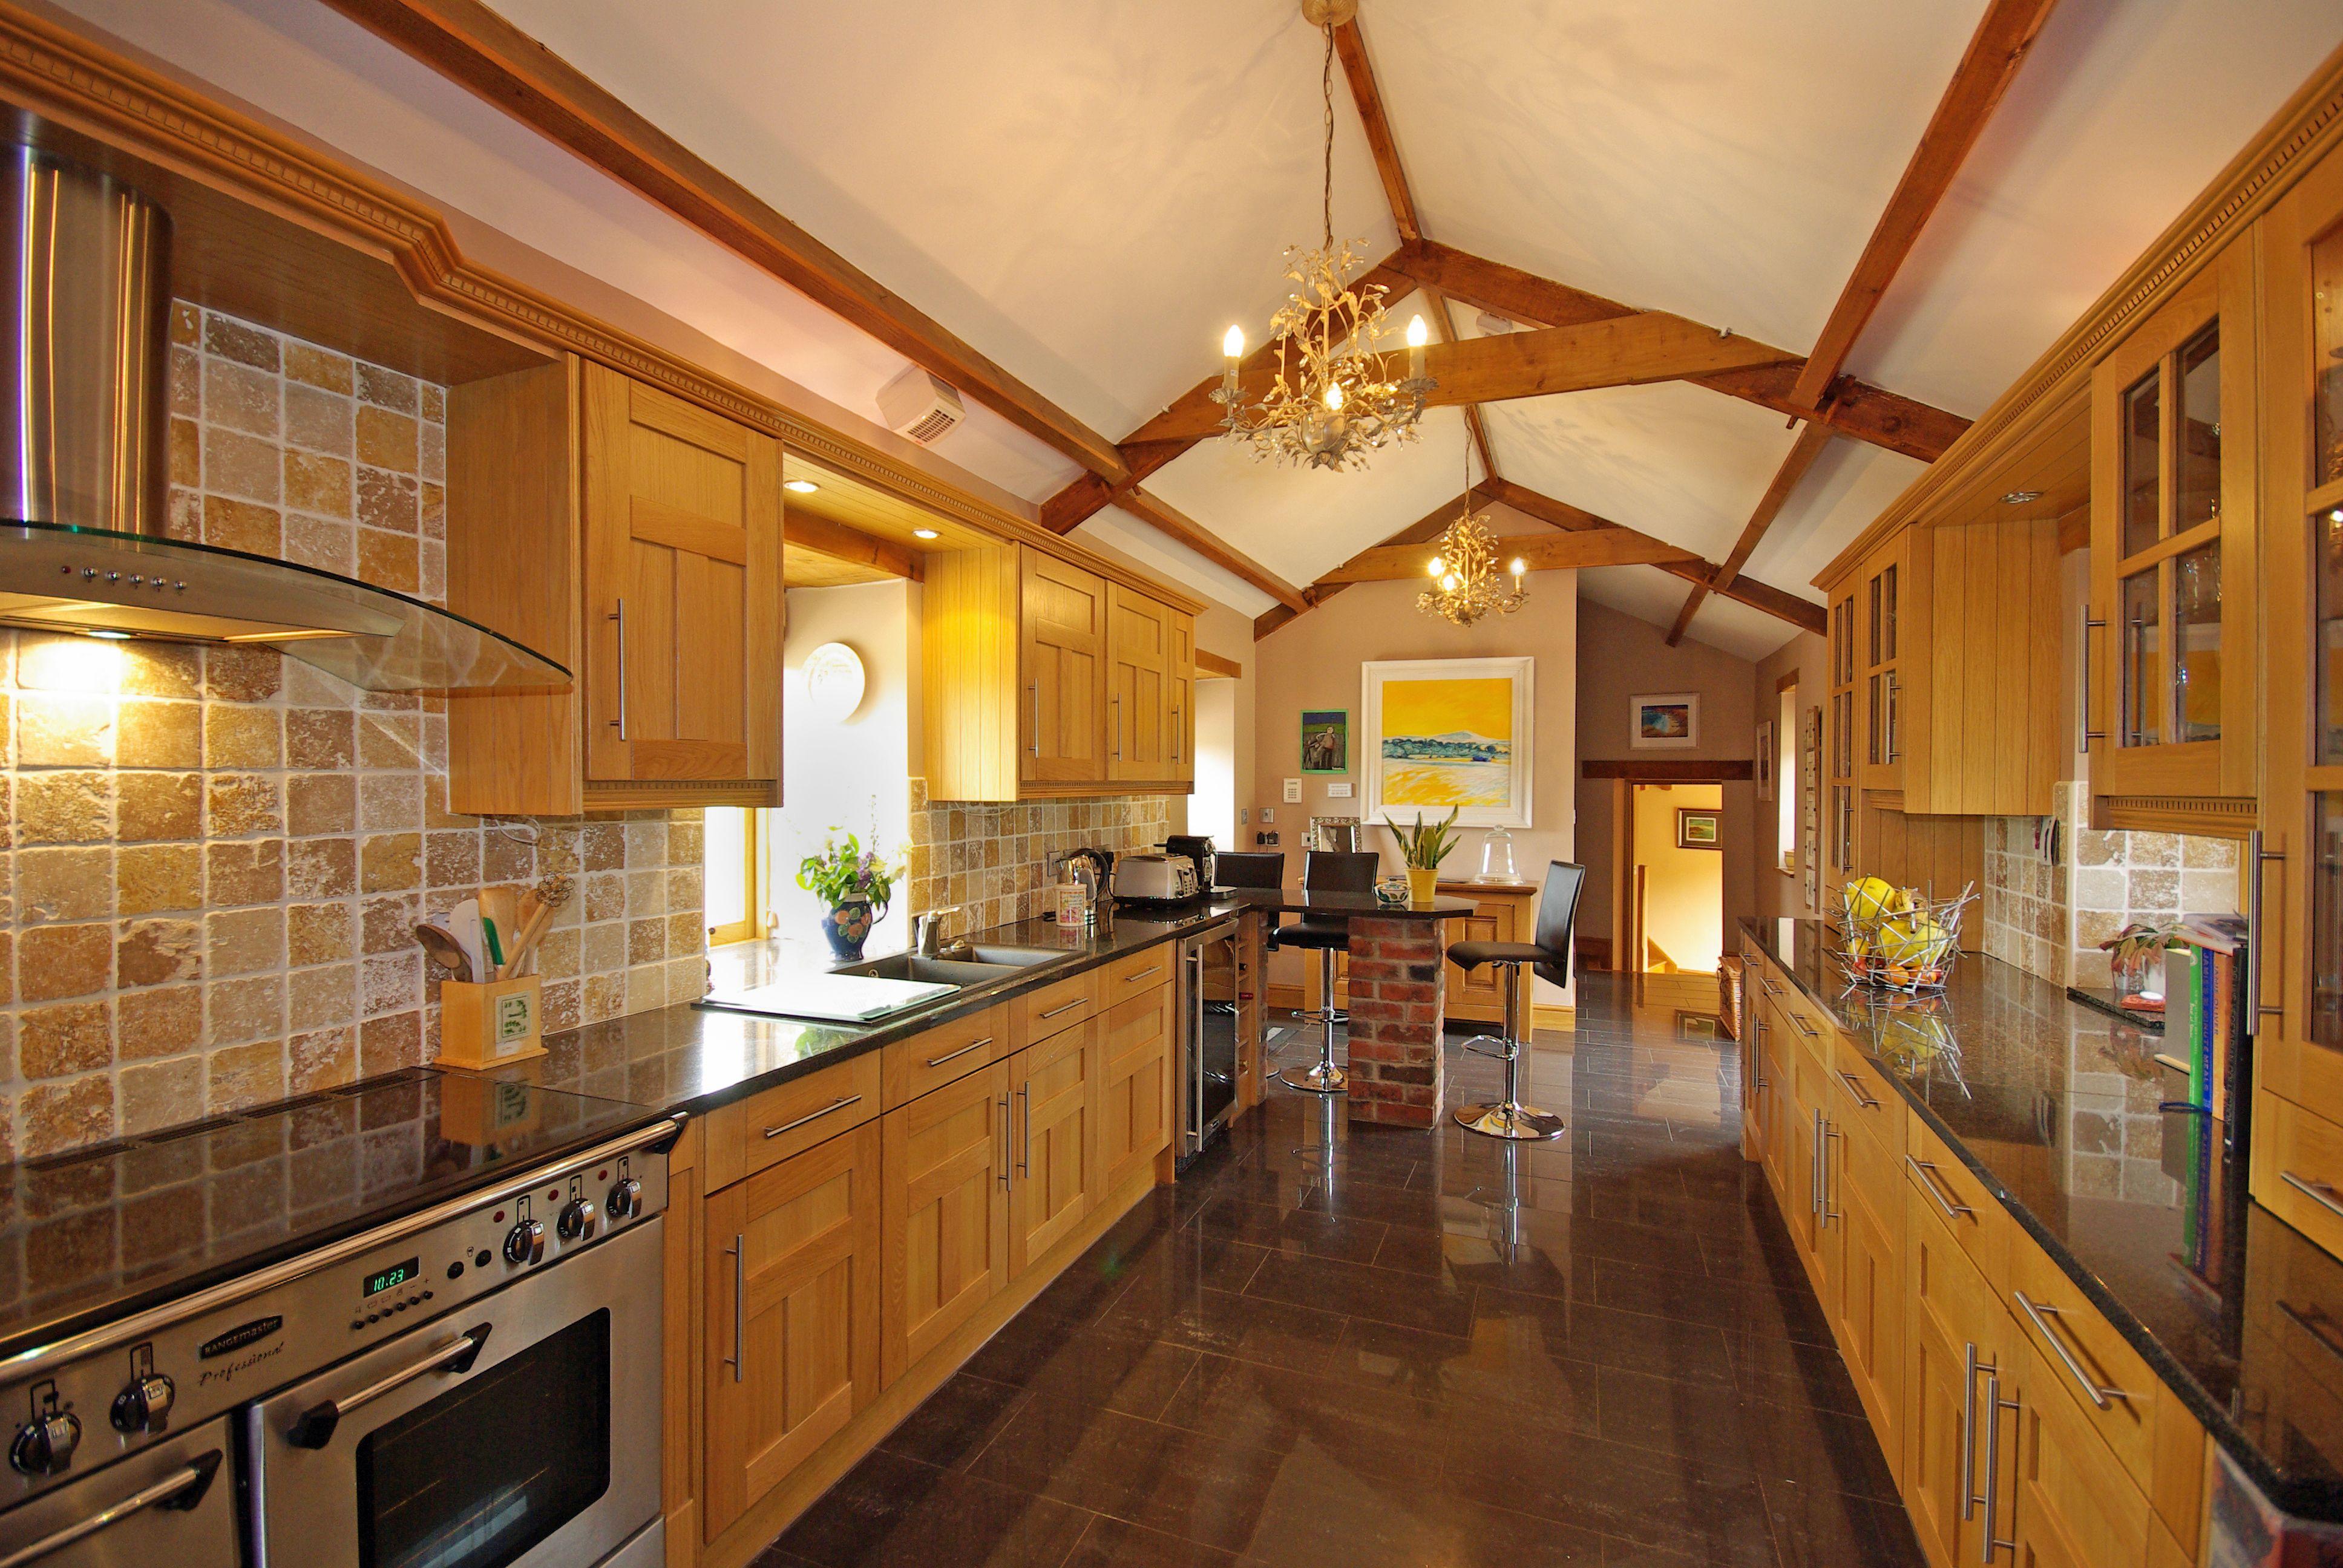 The Kitchen at Glen Court Barn, Usk superb barn